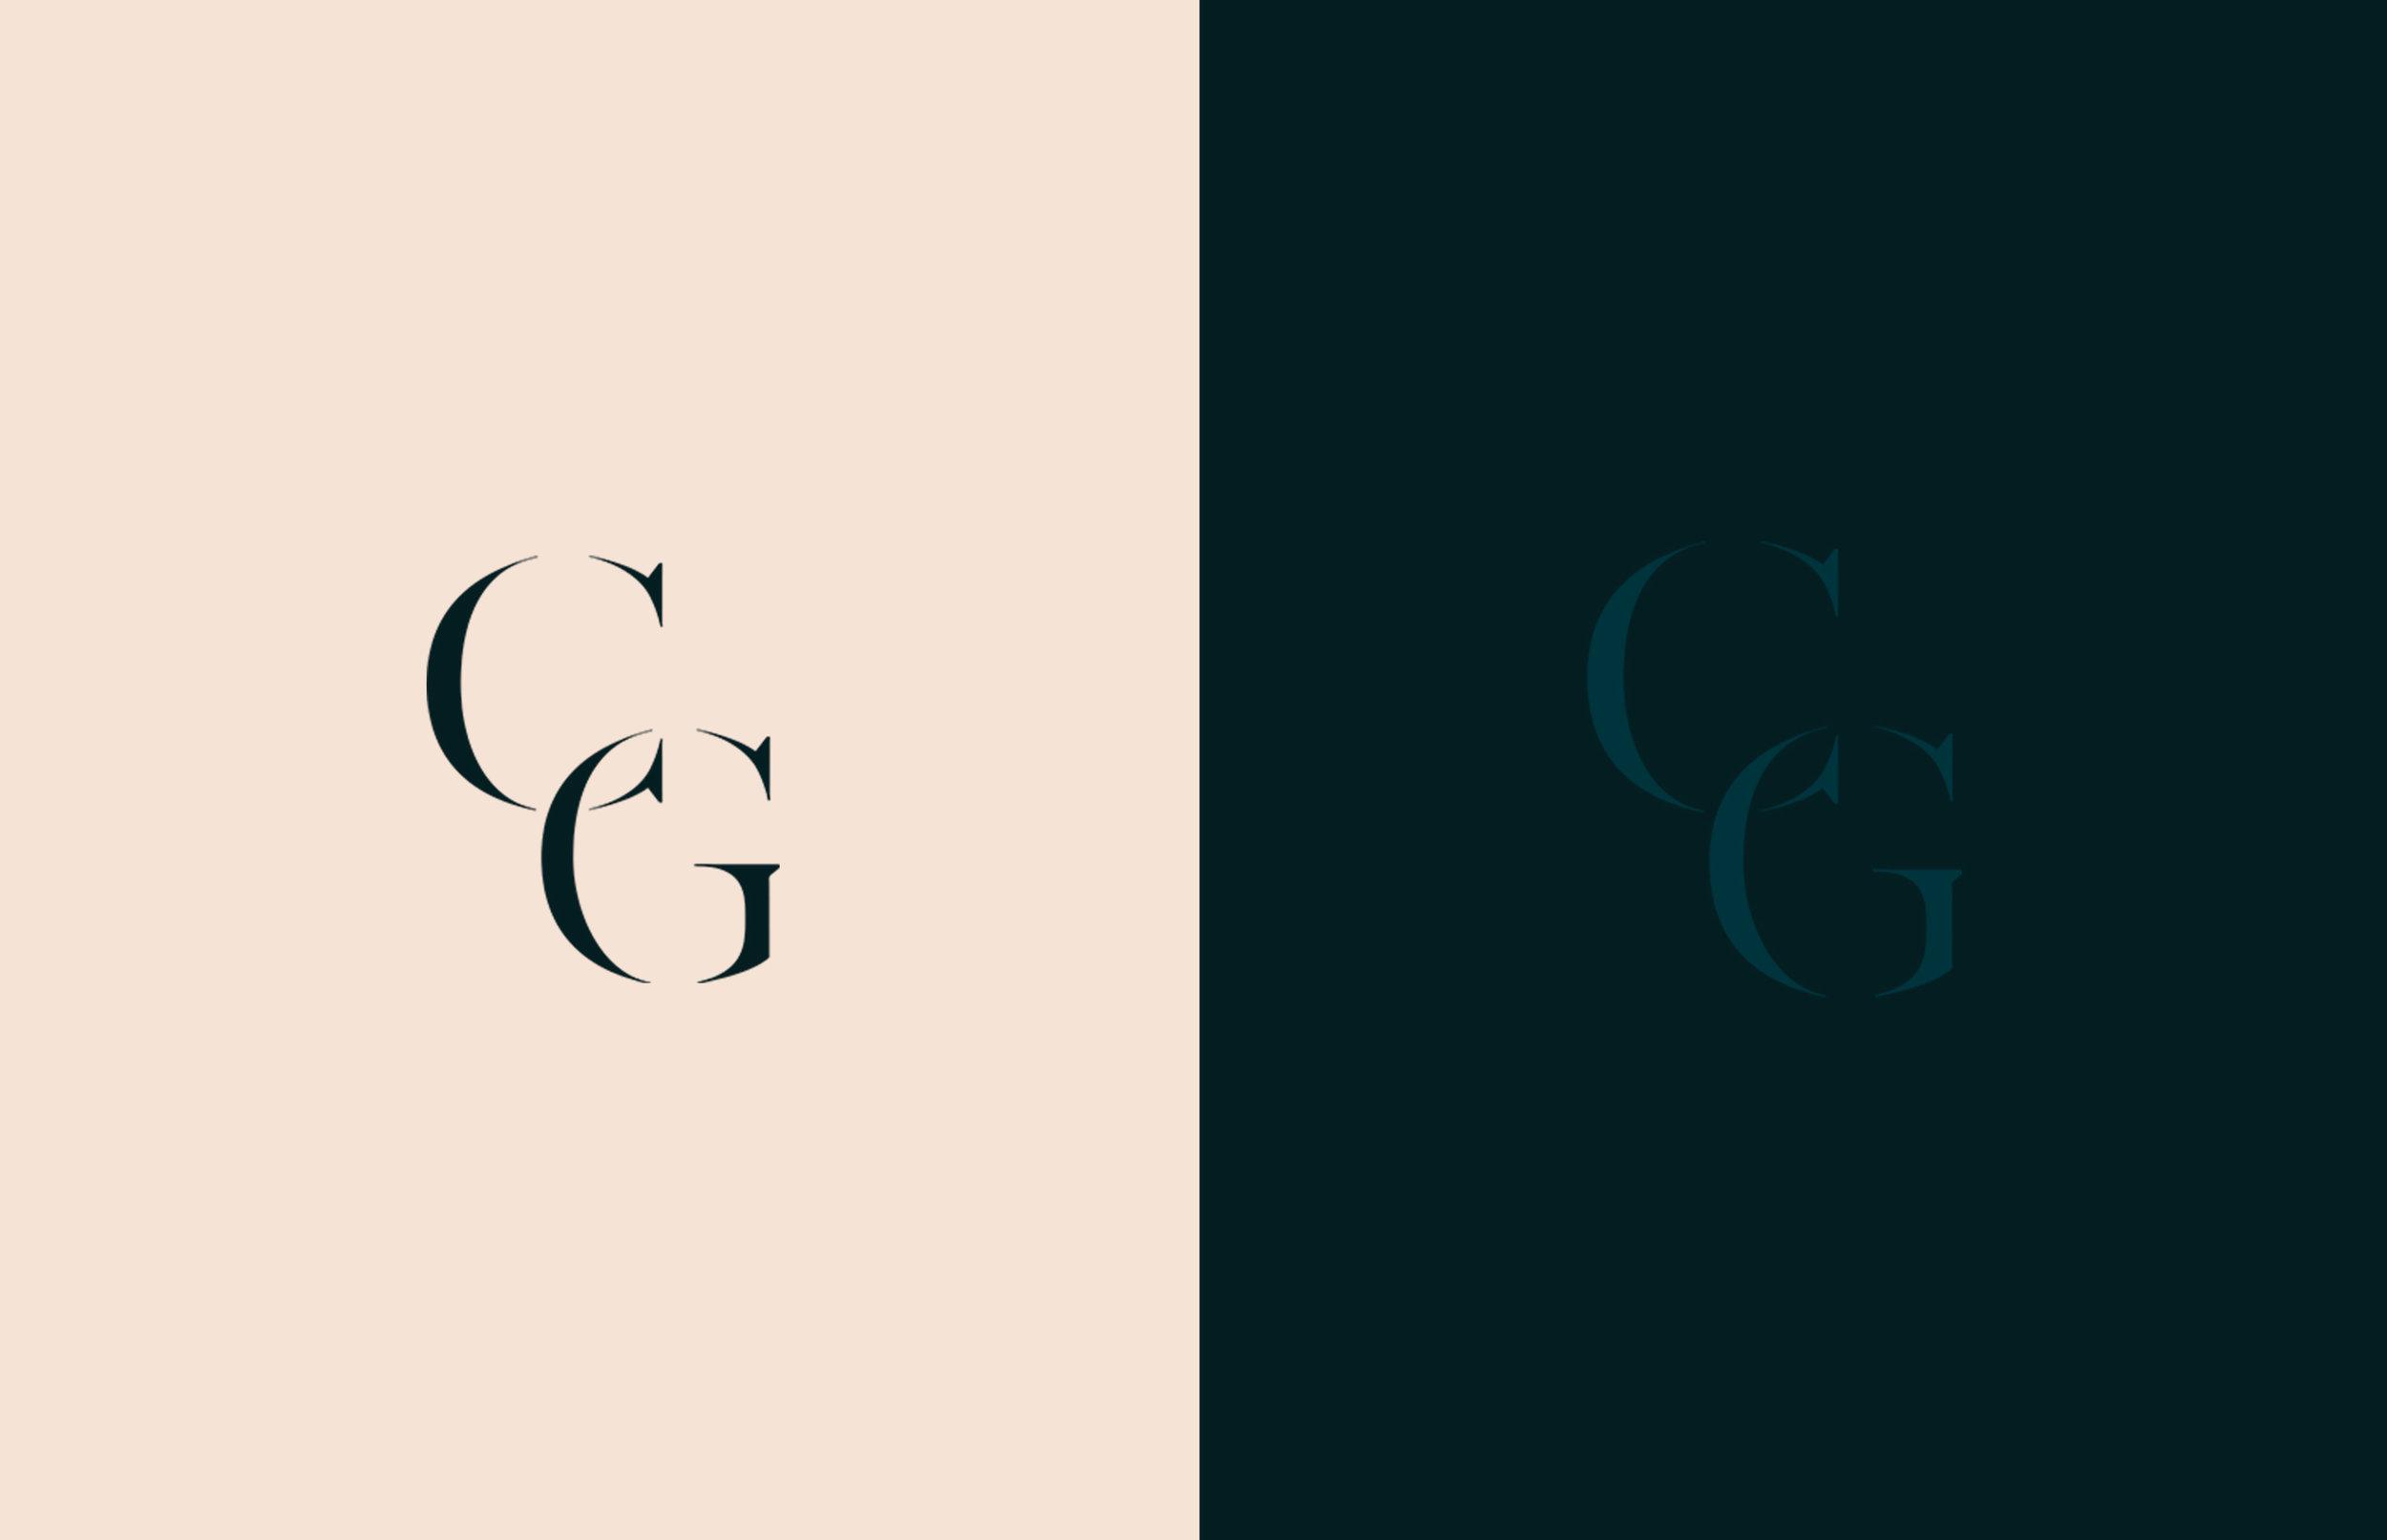 CG-CargoRefresh-Logos-CG.jpg